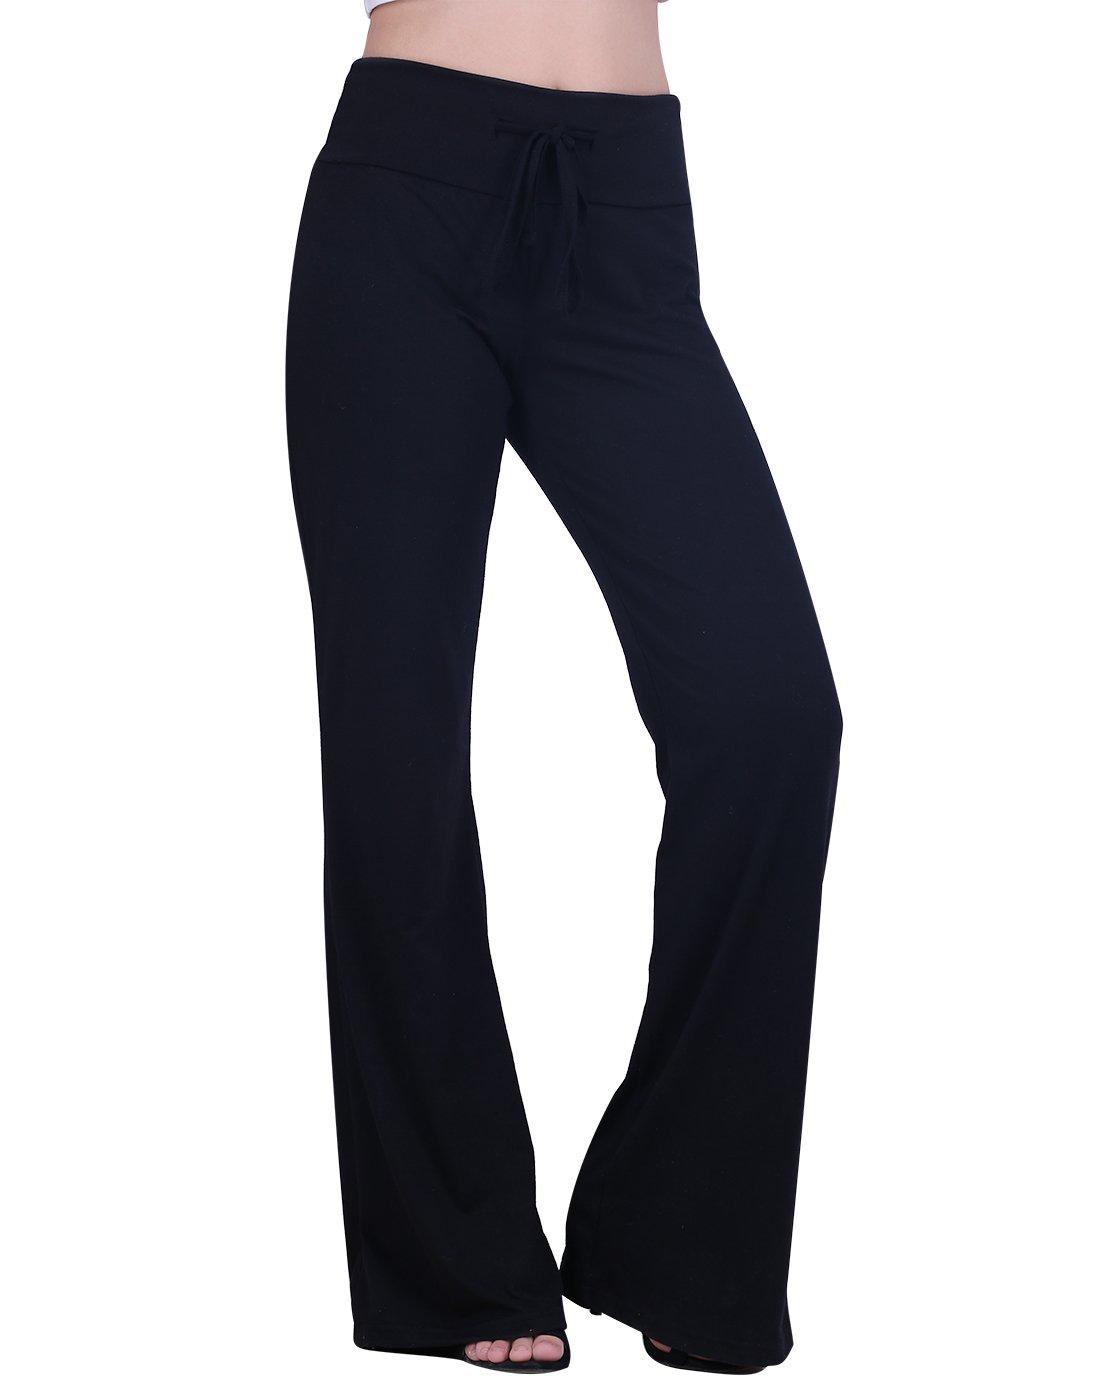 HDE Womens Cotton Pajama Pants Wide Leg Sleepwear Casual Loose Lounge PJ Bottoms,Black,X-Large